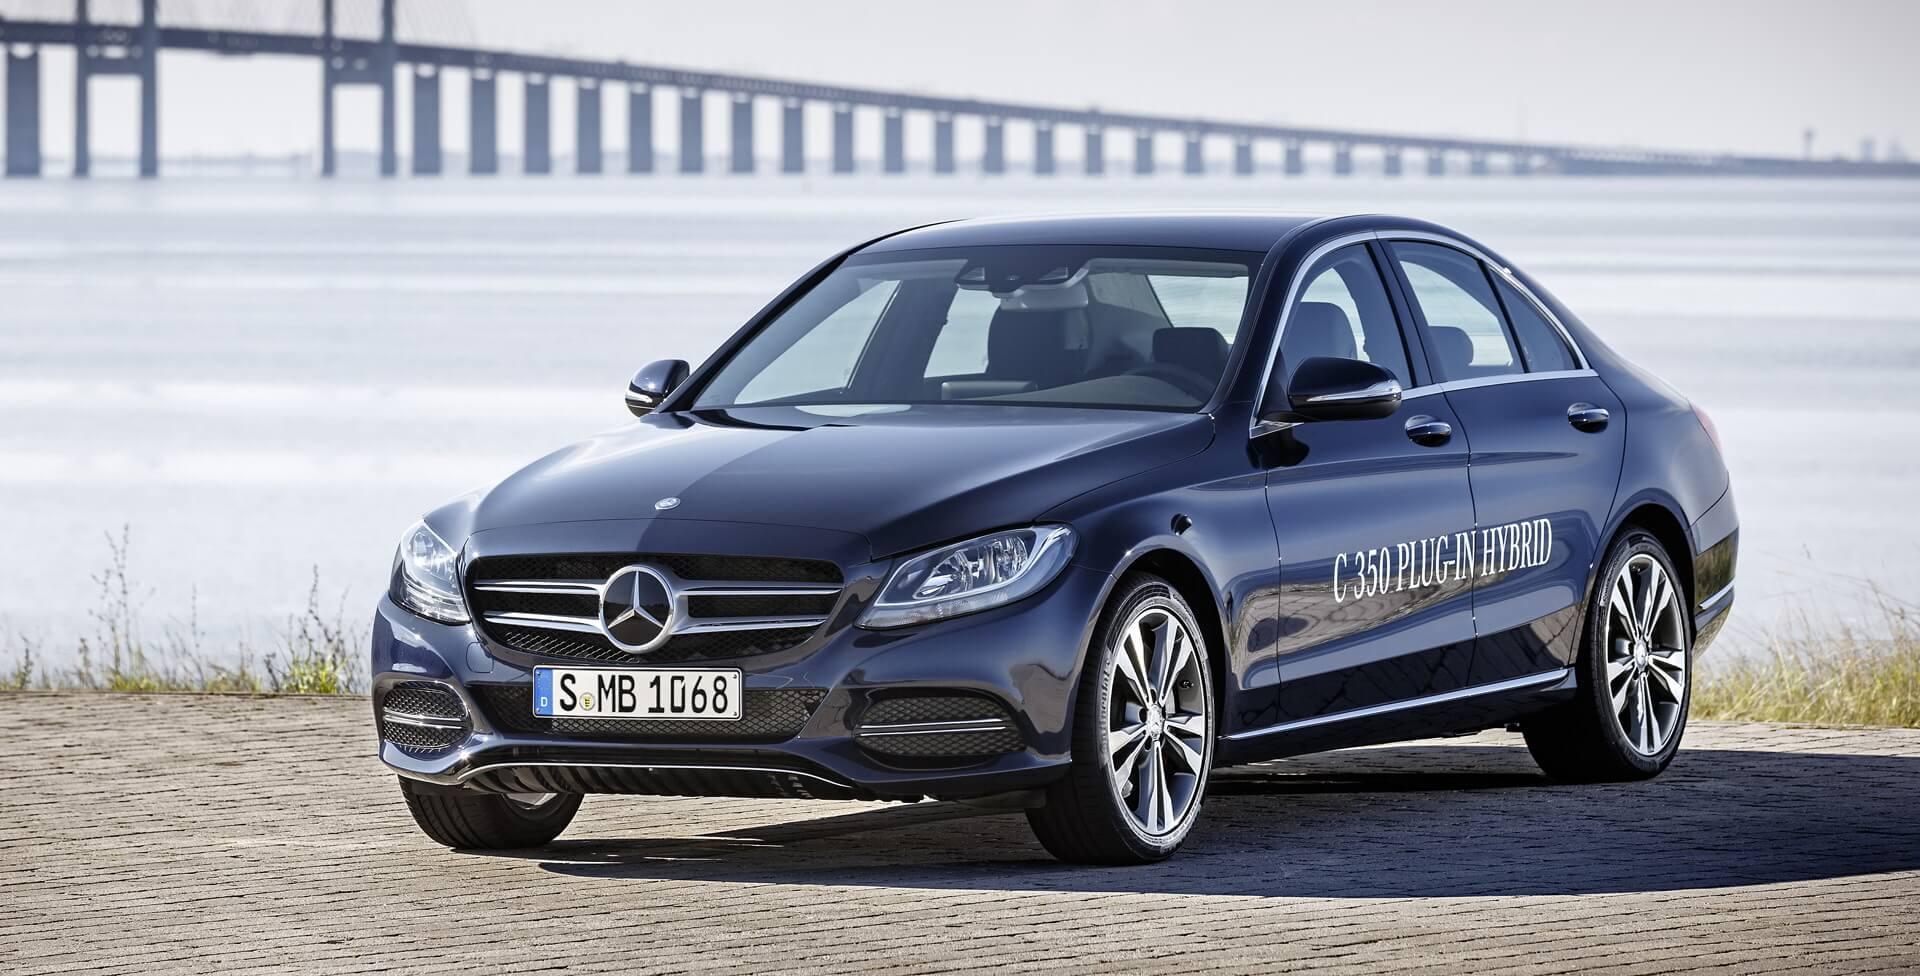 Победитель номинации «Connected Green Car ofthe Year» — плагин-гибрид Mercedes-Benz C350e